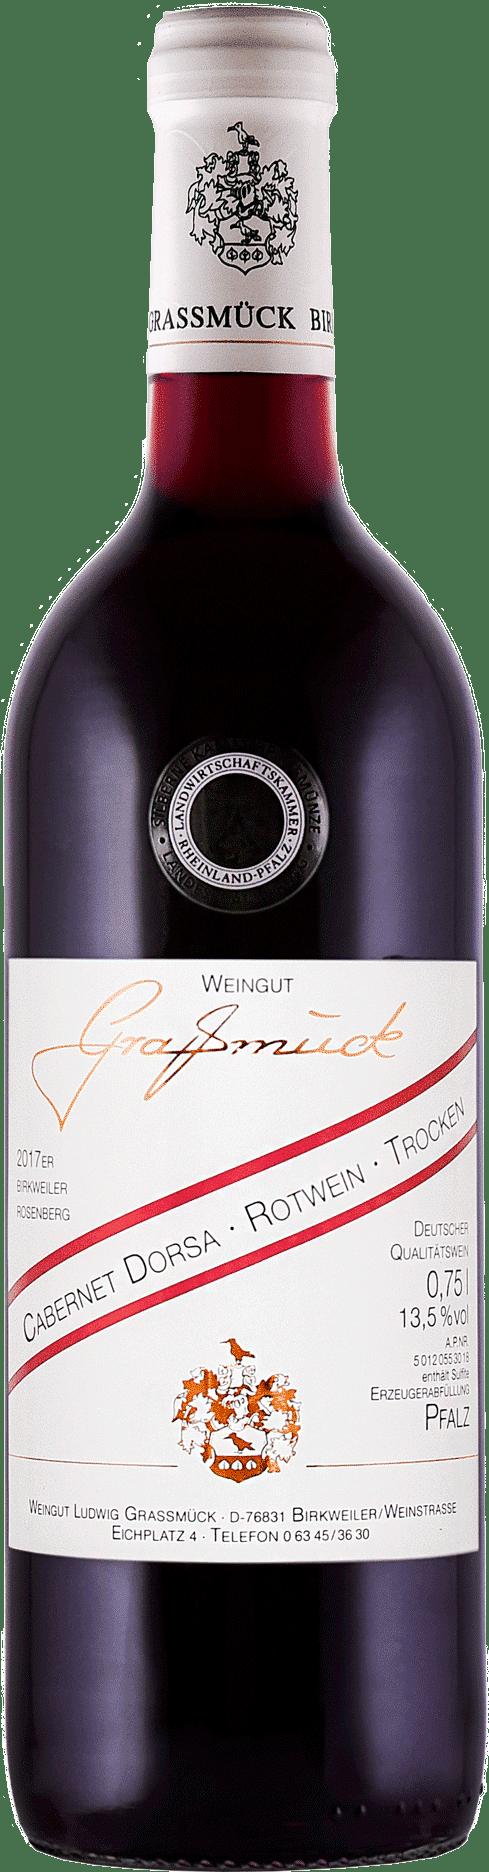 Weingut Ludwig Graßmück, Simon Graßmück, Cabernet Dorsa Rotwein, trocken